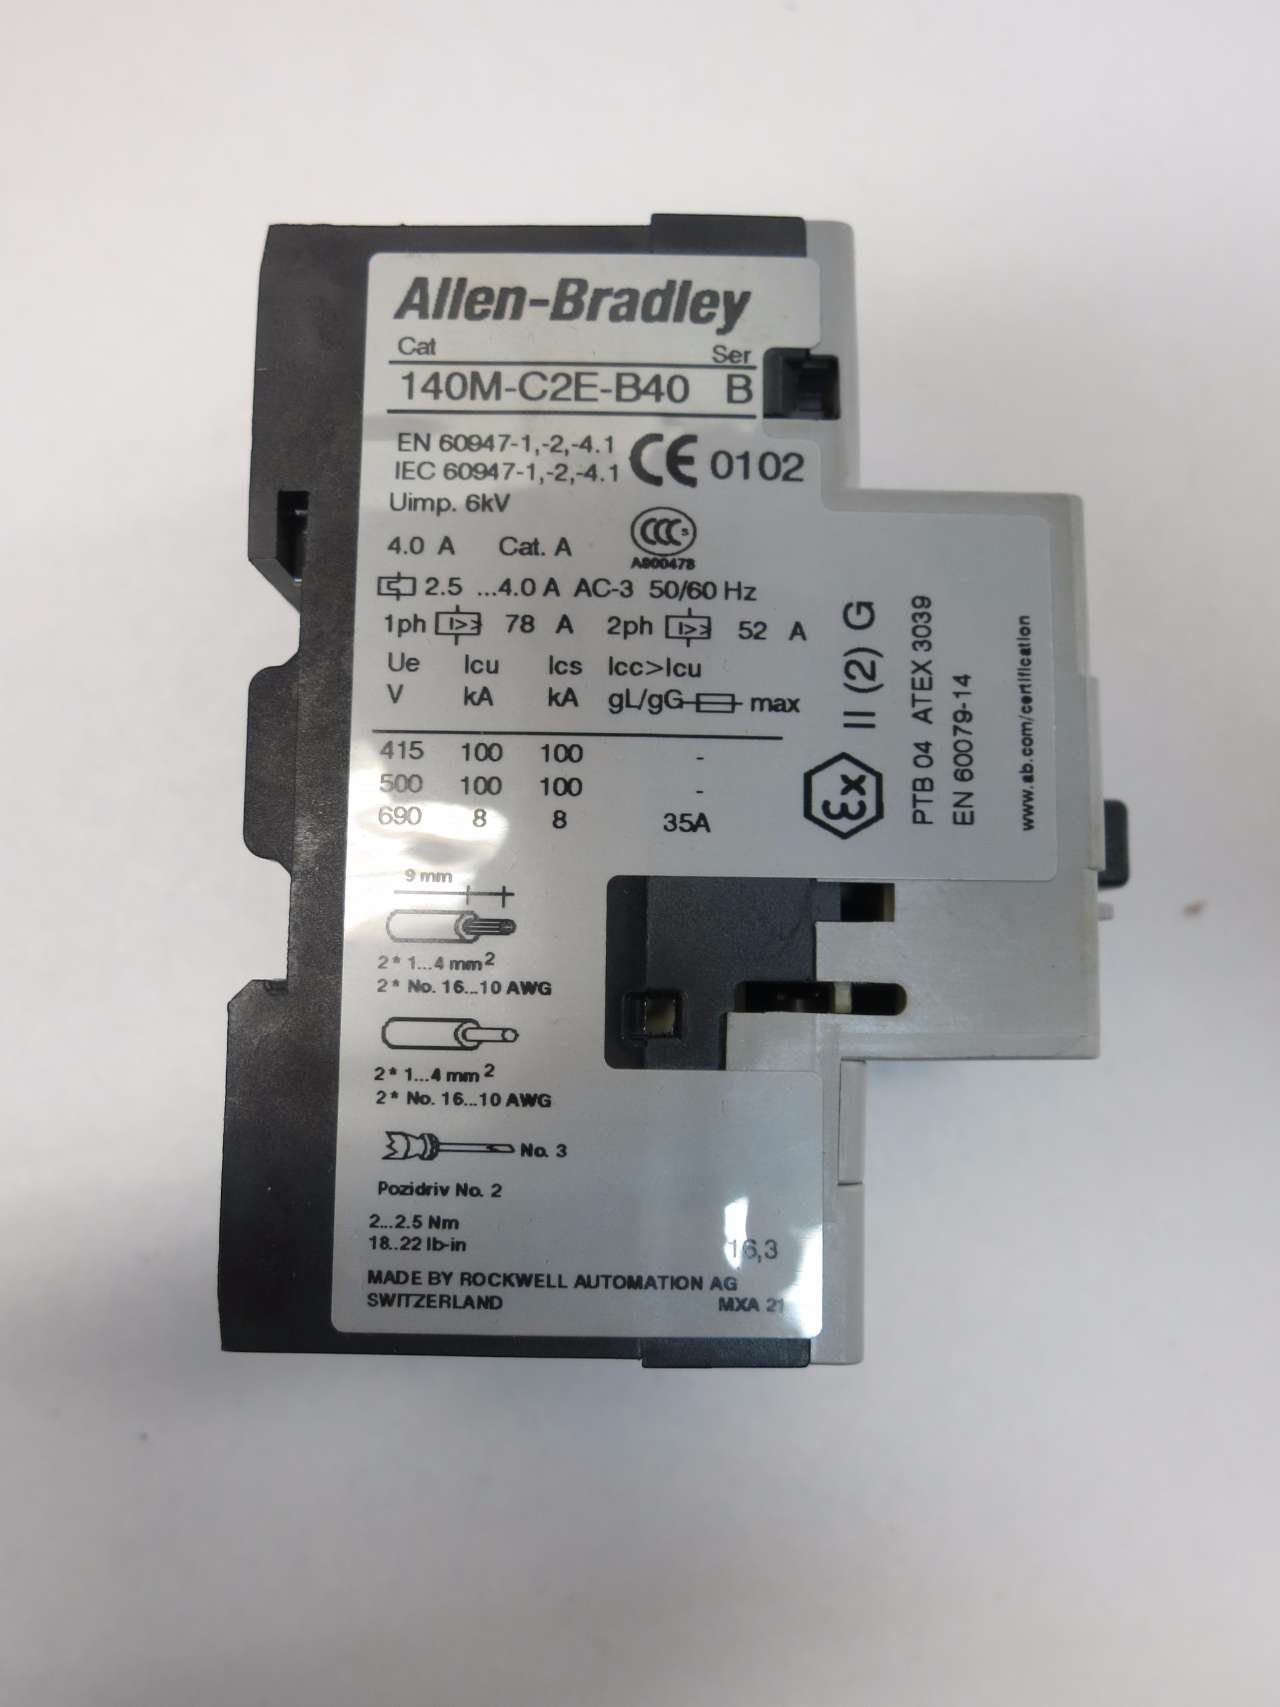 NEW ALLEN BRADLEY 140M-C2E-B40 SER B 3HP 2.5-4A AMP MANUAL MOTOR STARTER D512285 by Allen-Bradley (Image #6)